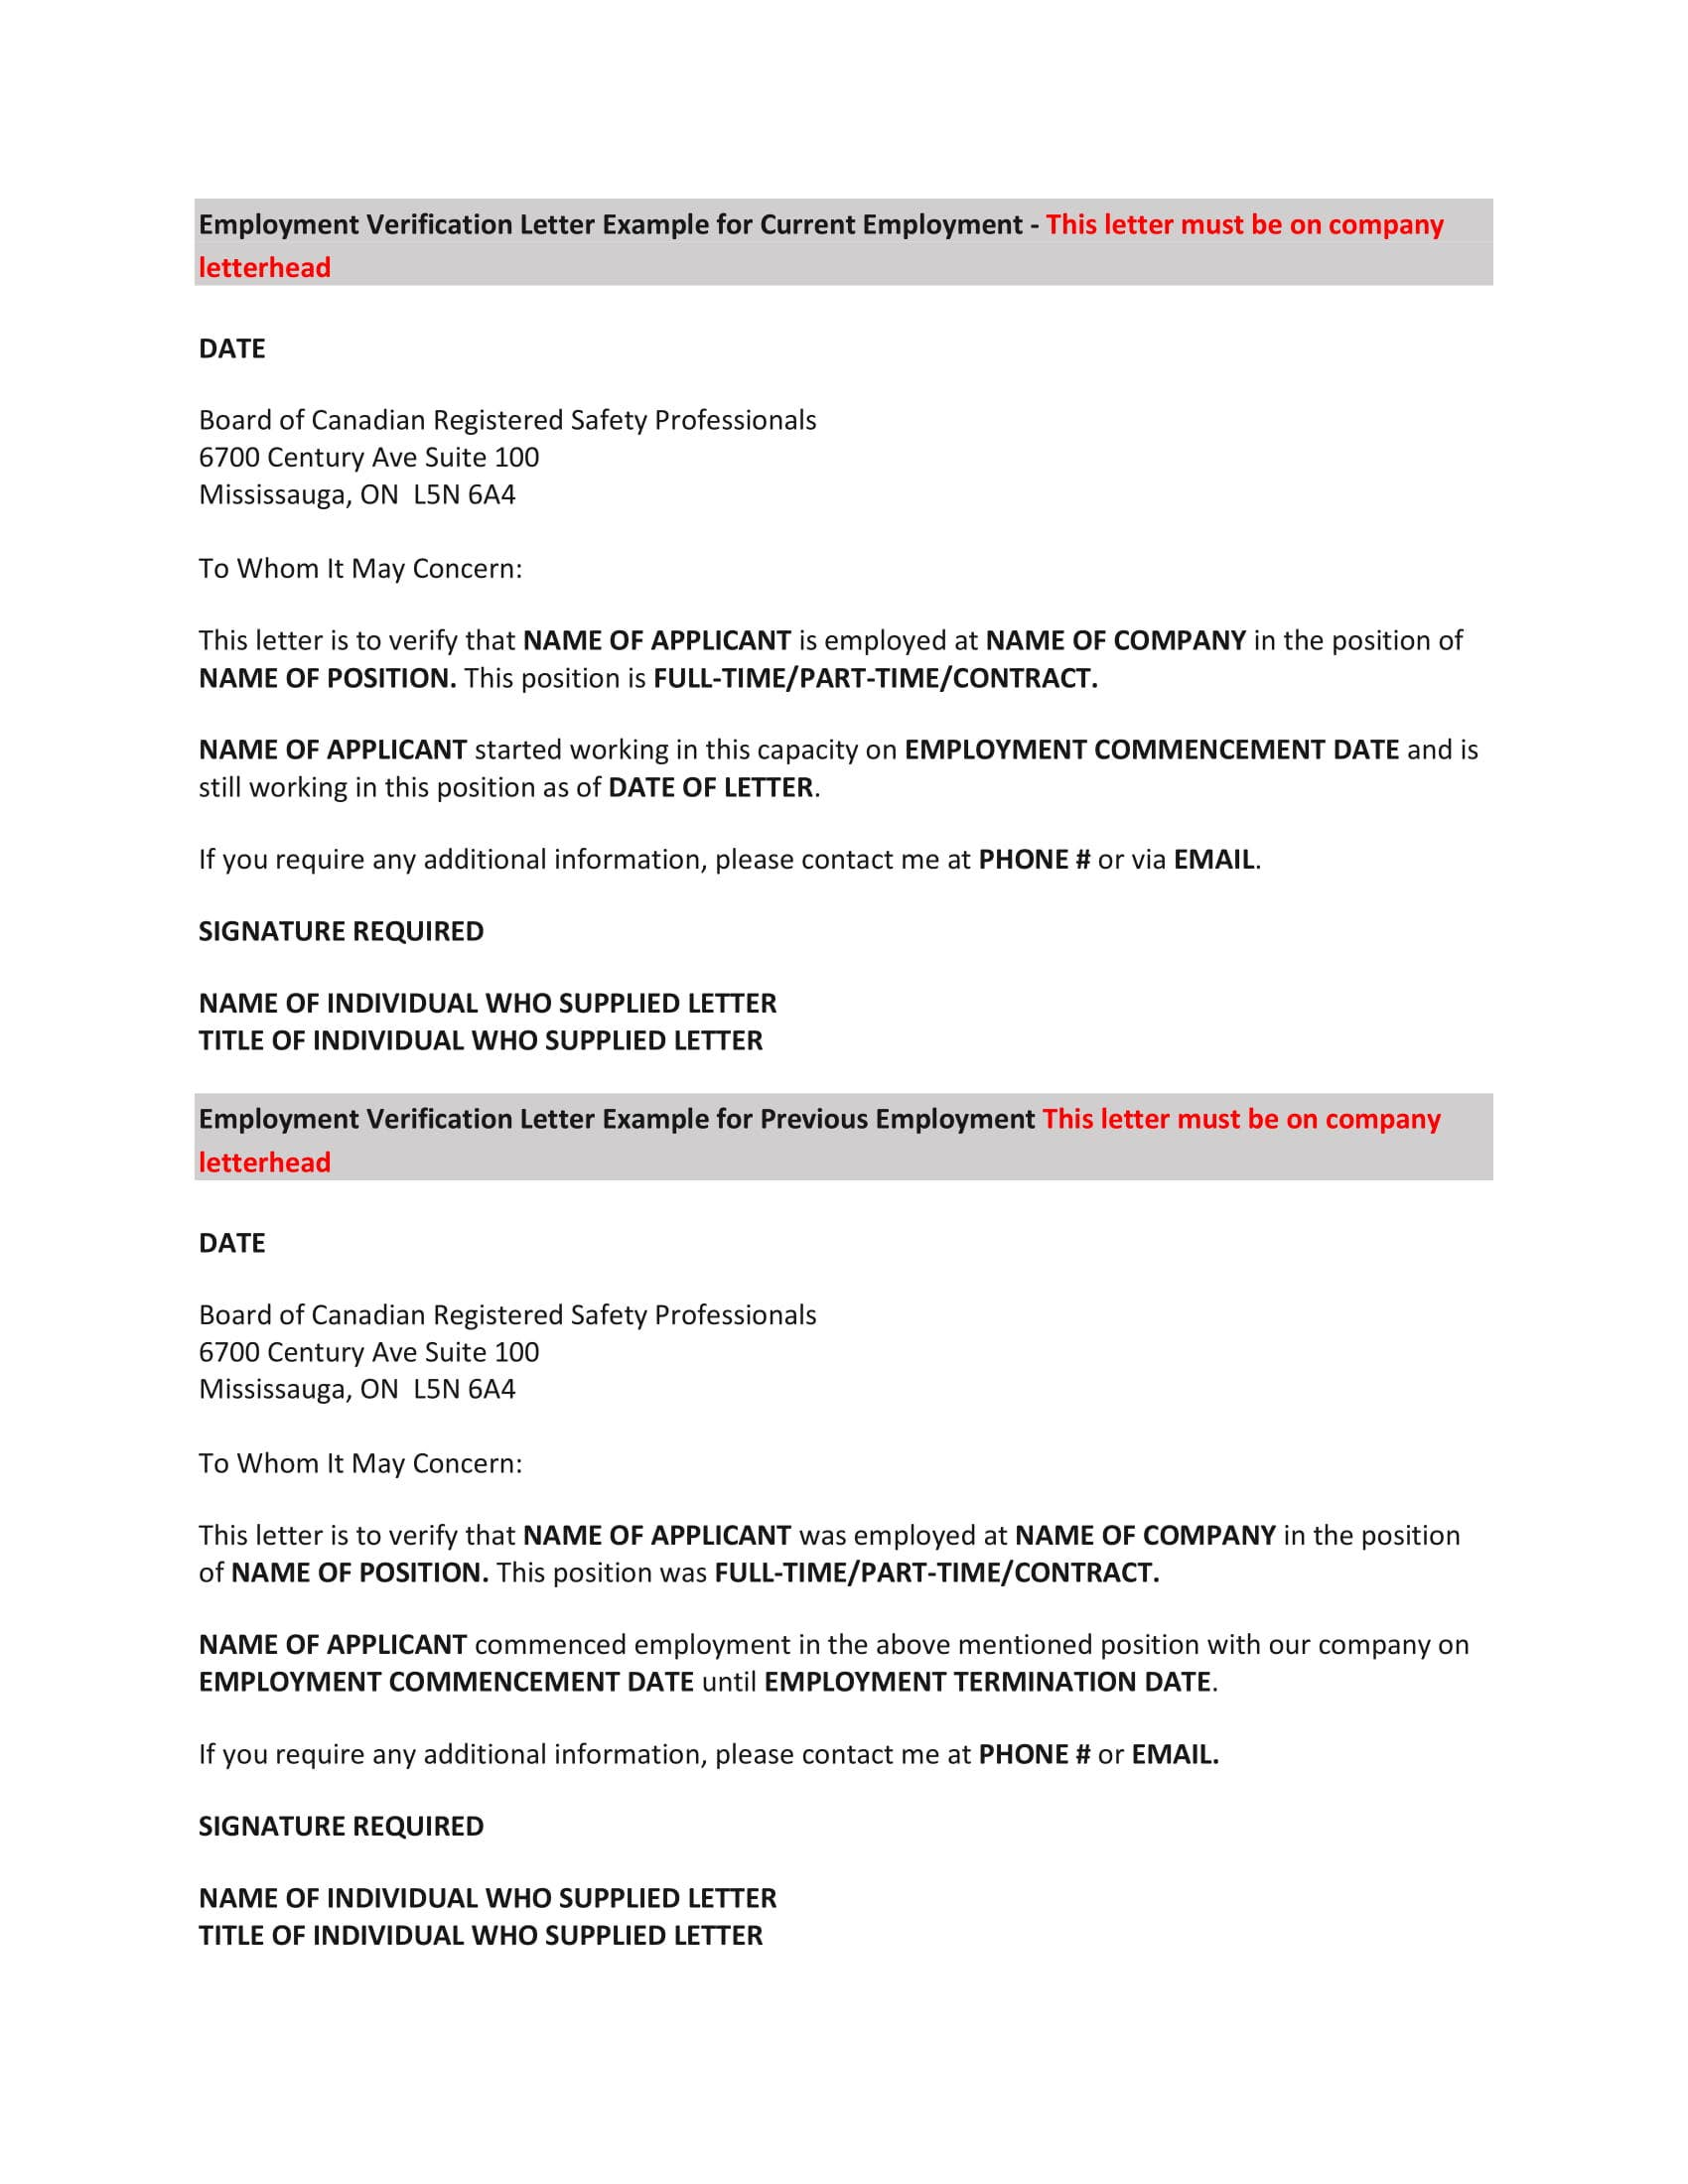 employment verification letter example 1